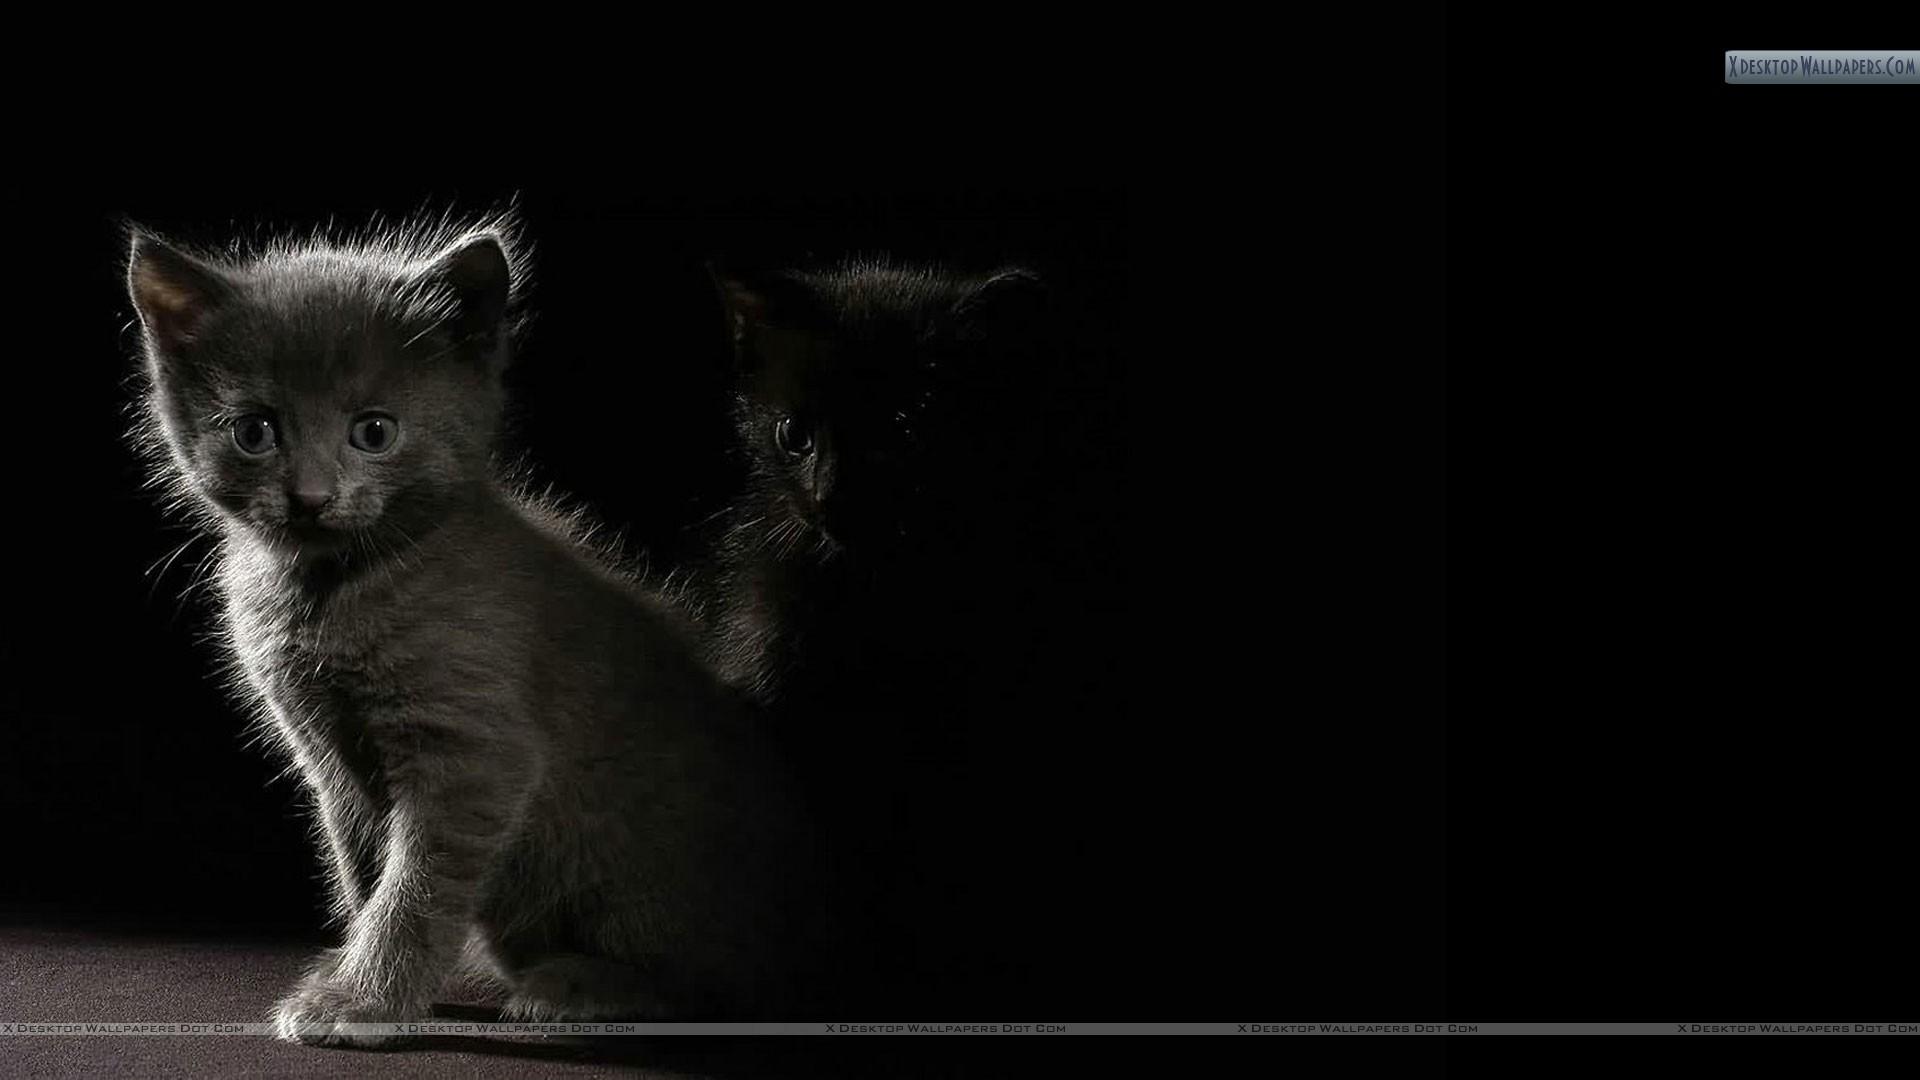 Cat In Dark Shadow Wallpaper 1920x1080